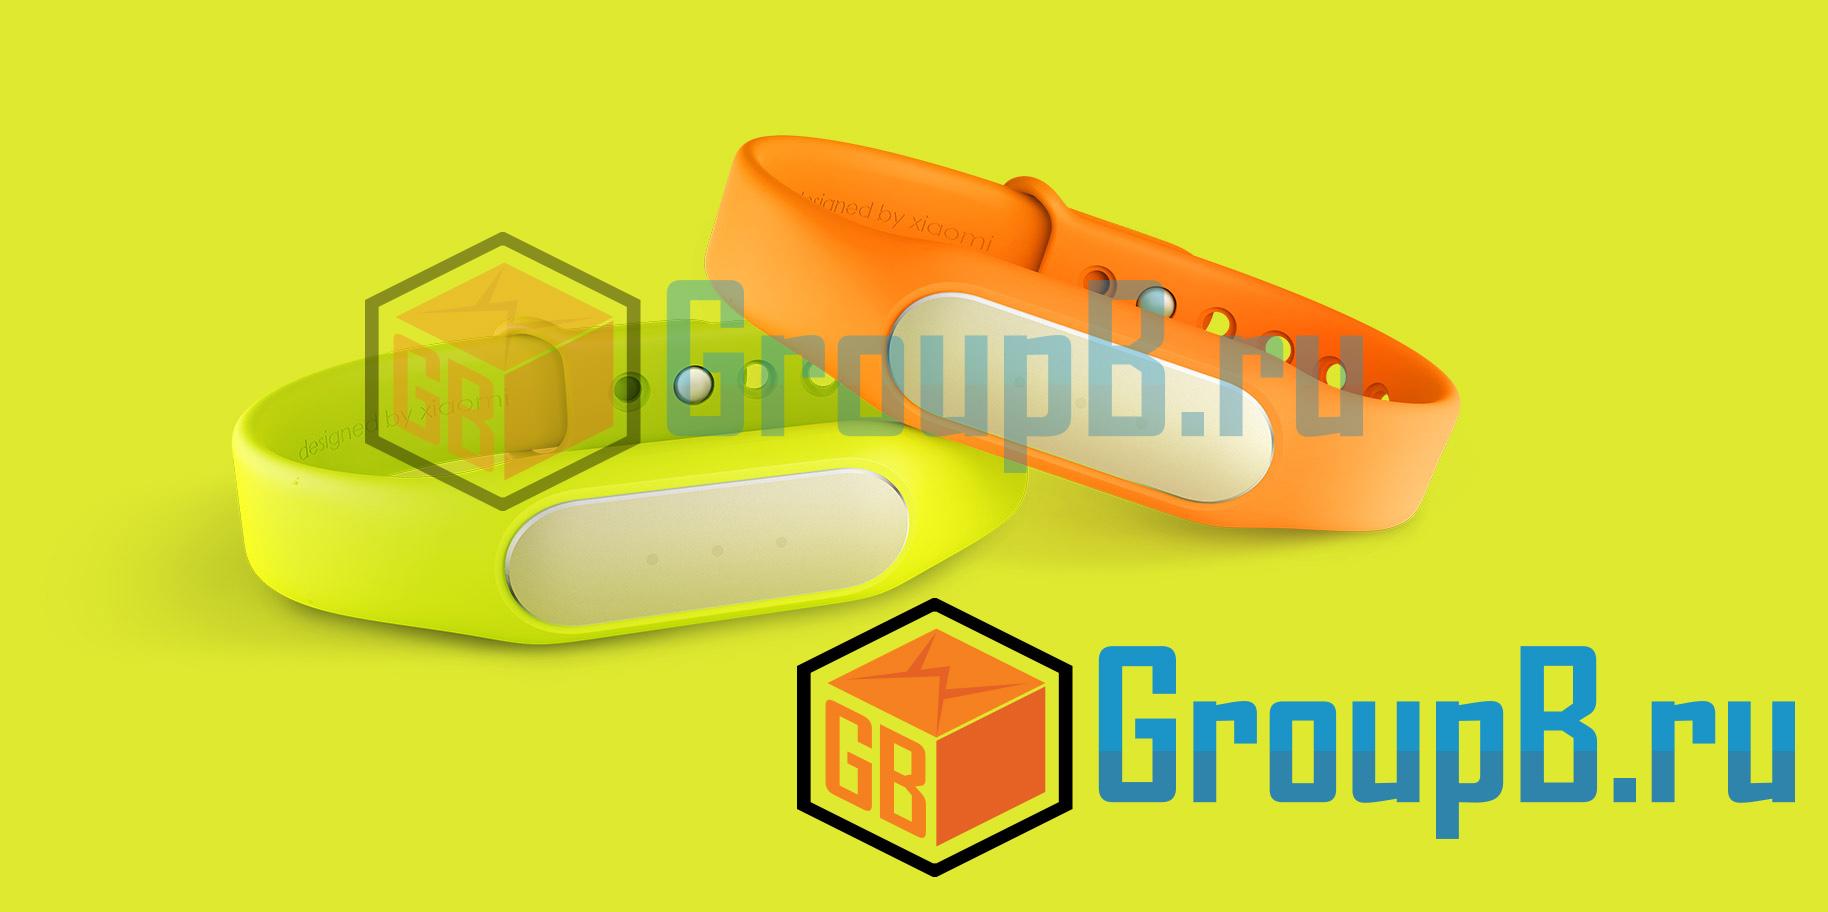 xiaomi Mi Band wristband